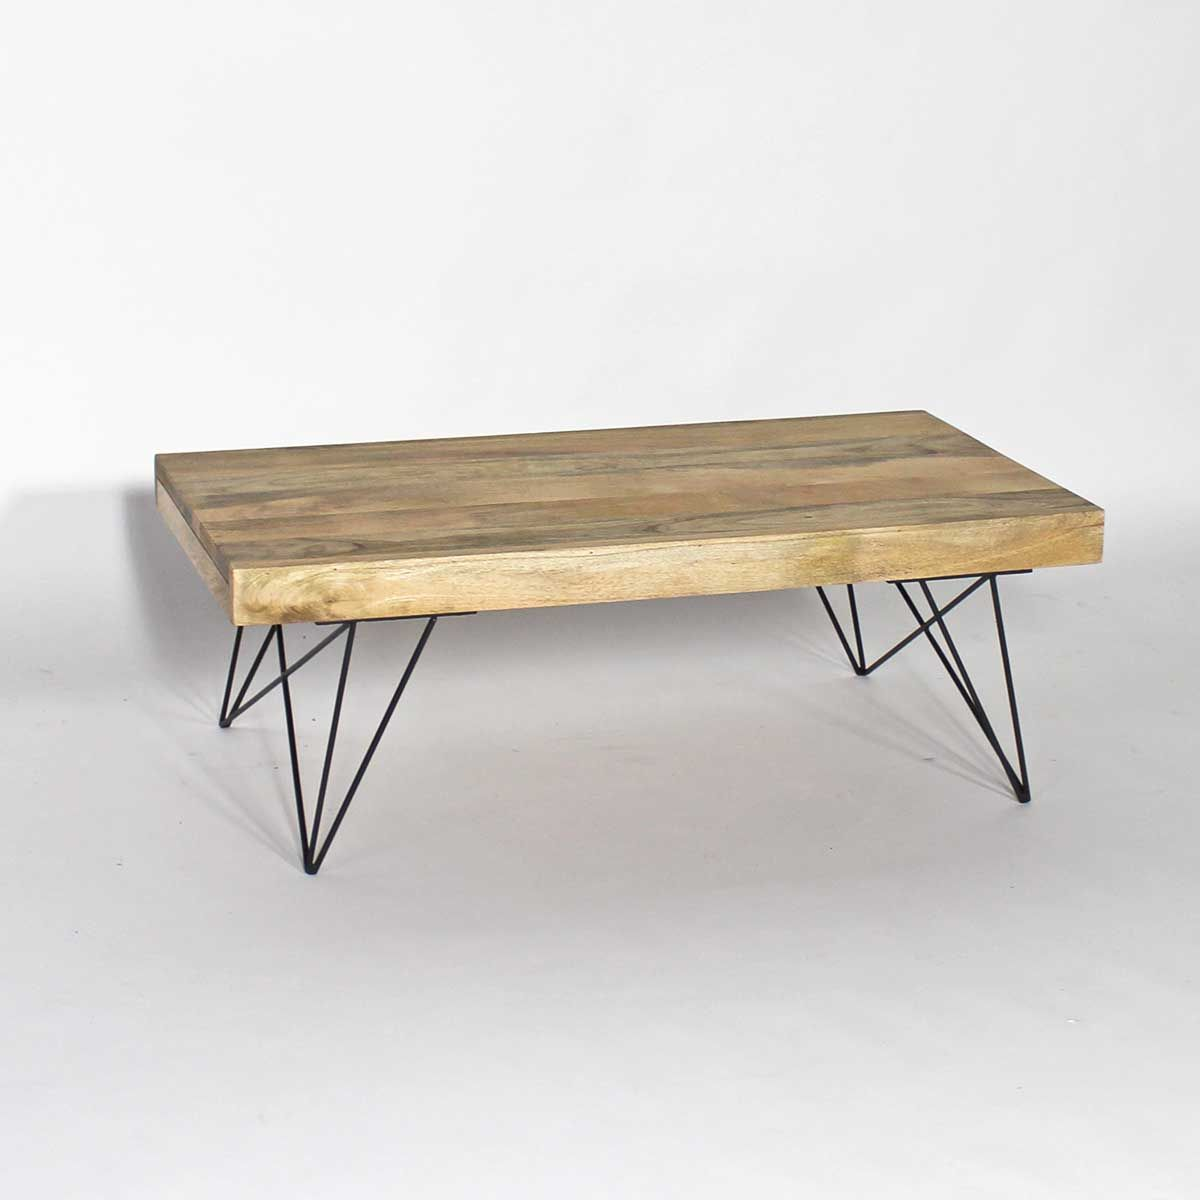 Table Basse Bois Metal Style Scandinave Bt0278x Made In Meubles Prix Avis Notation Livraison C Table Basse Bois Table Basse Table Basse Bois Metal